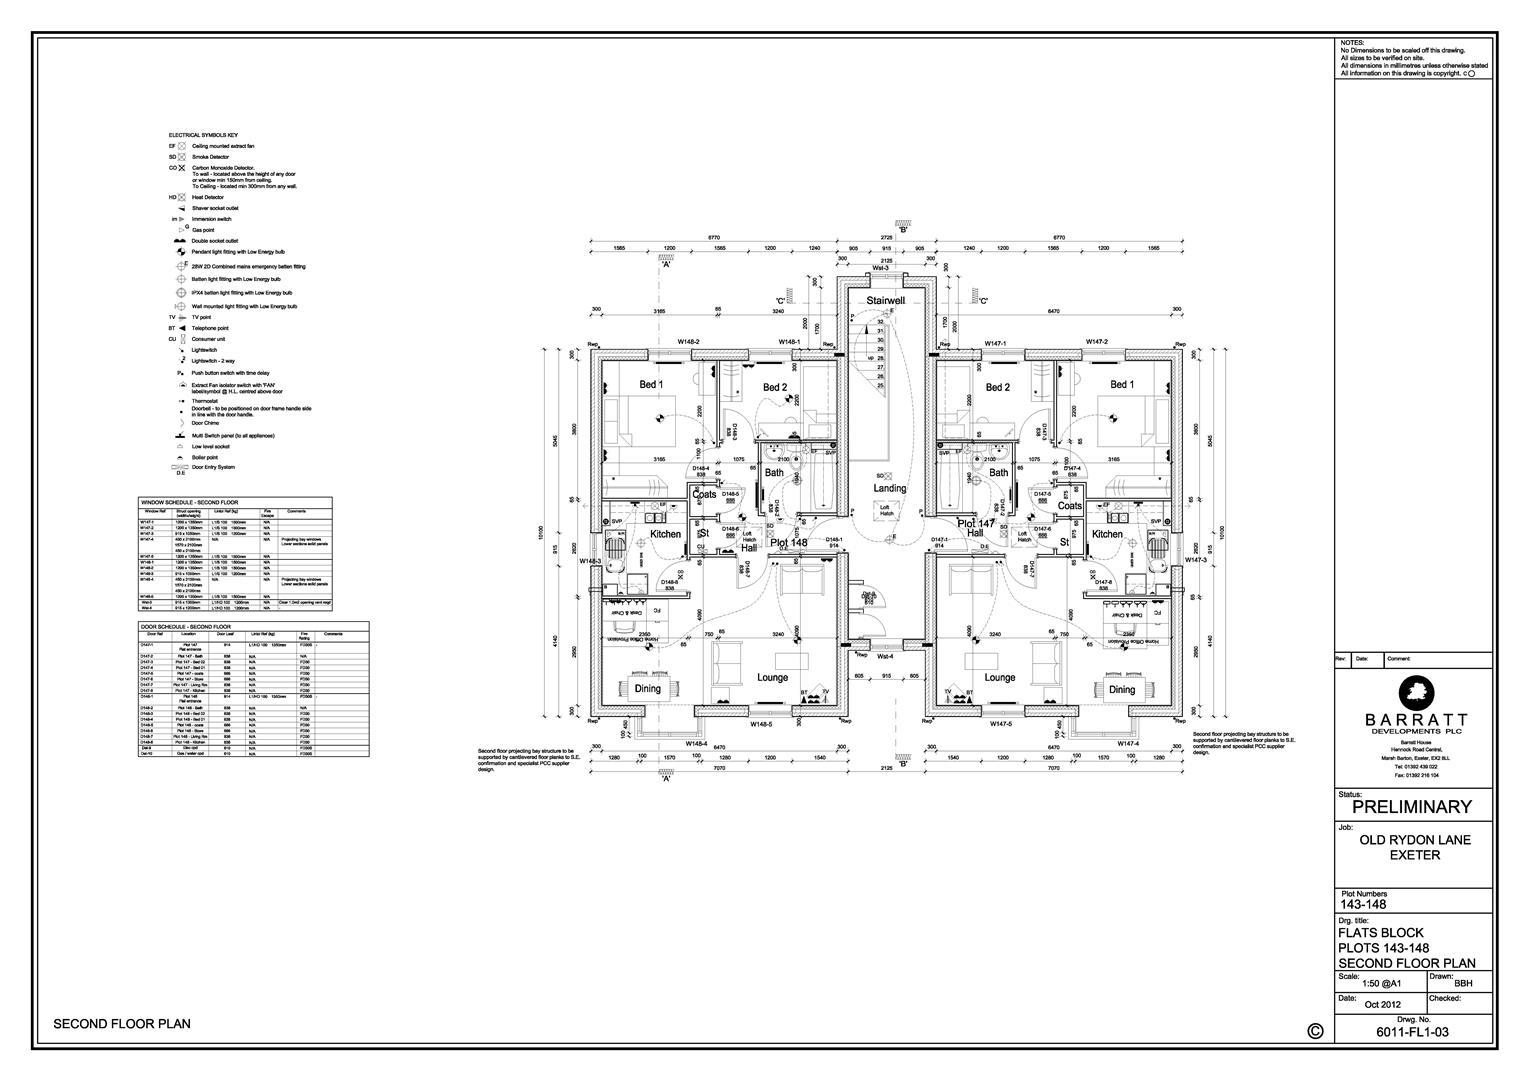 Old Rydon Lane_Plots 143-148 Flats_Second Floor Pl